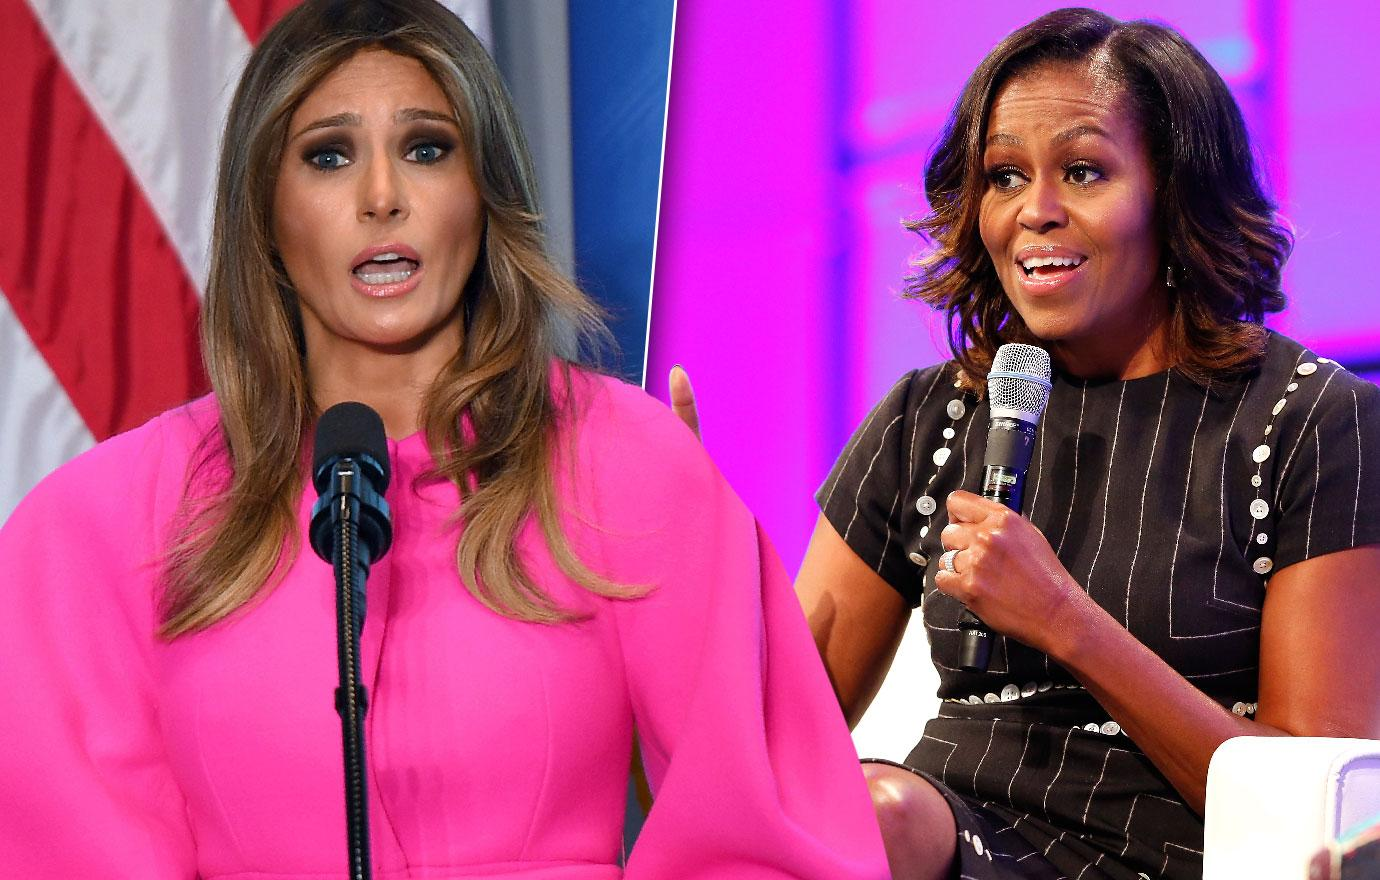 Melania Trump Slashes FLOTUS Bloated Budget From Michelle Obama